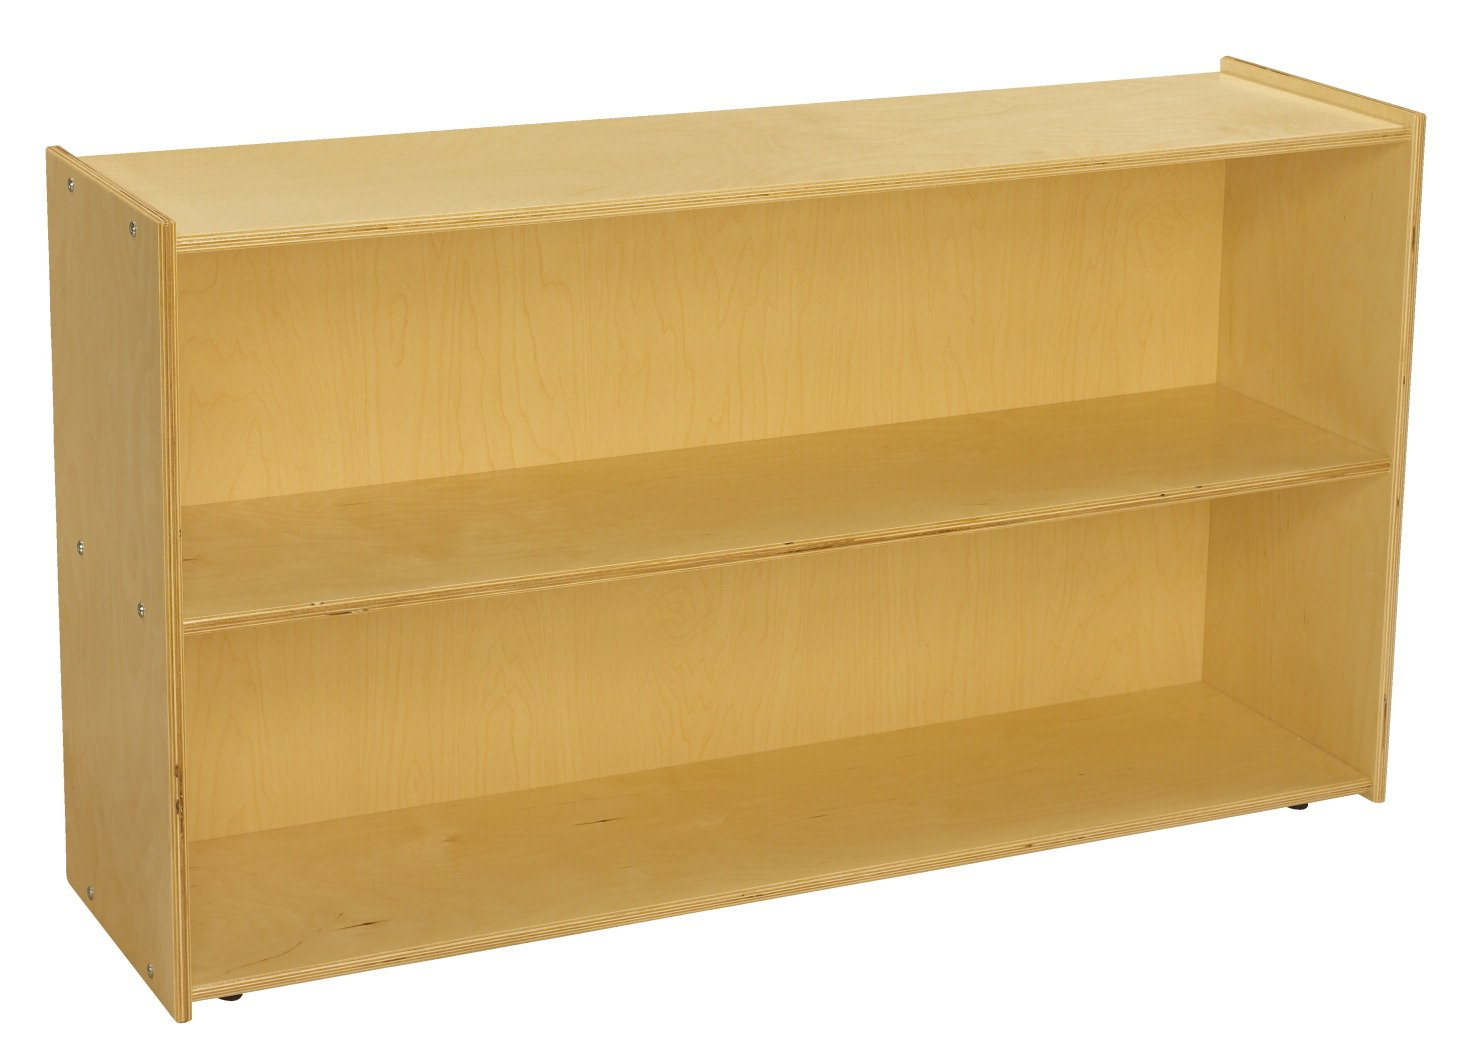 Childcraft ABC Furnishings 2-Shelf Storage Unit, 48 W x 13 D x 27-3/8 H in